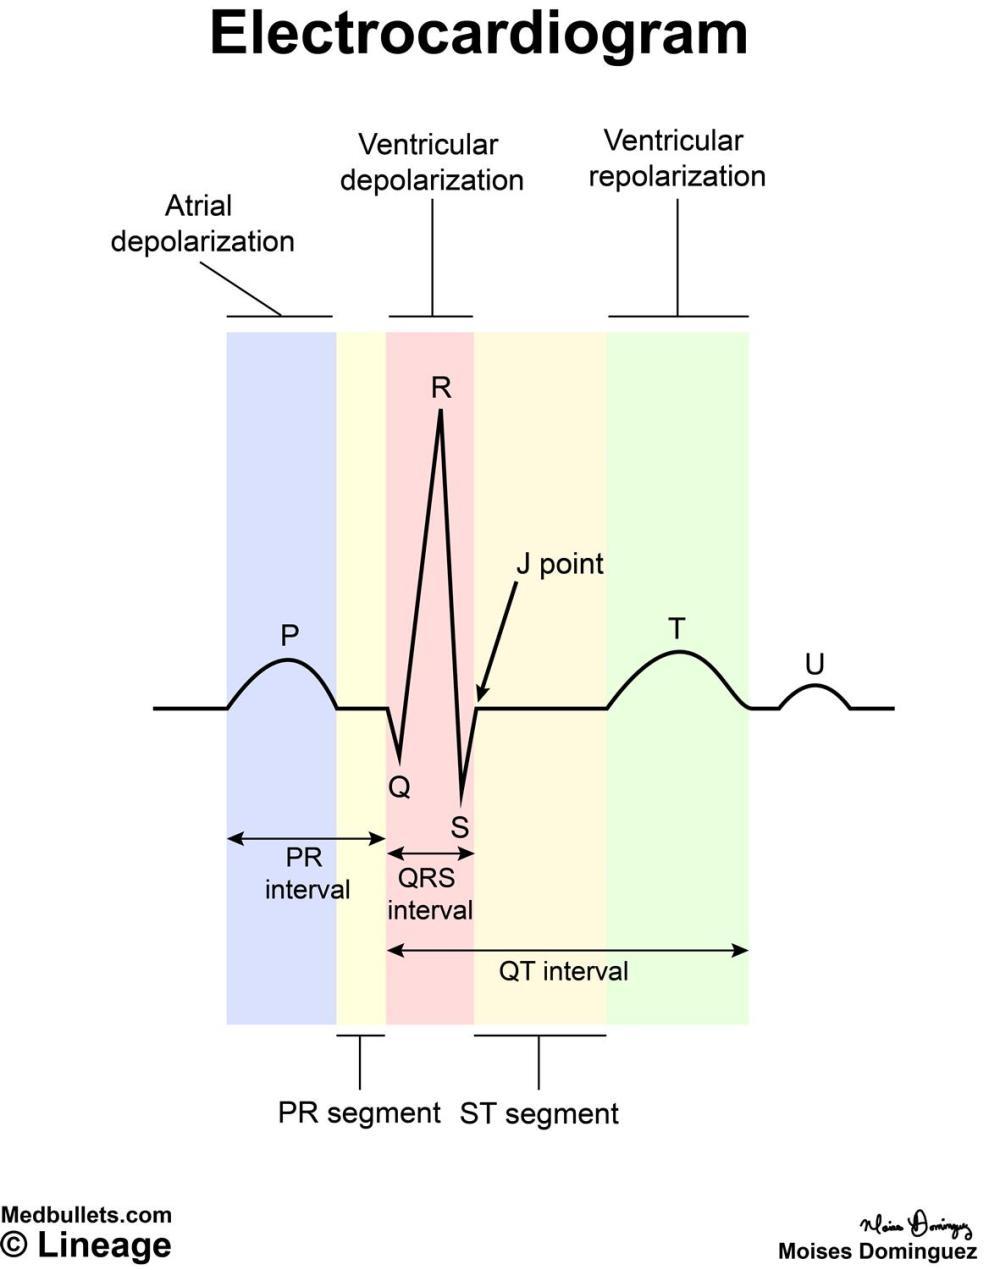 medium resolution of electrocardiogram ecg cardiovascular medbullets step 1electrocardiogram diagram 13